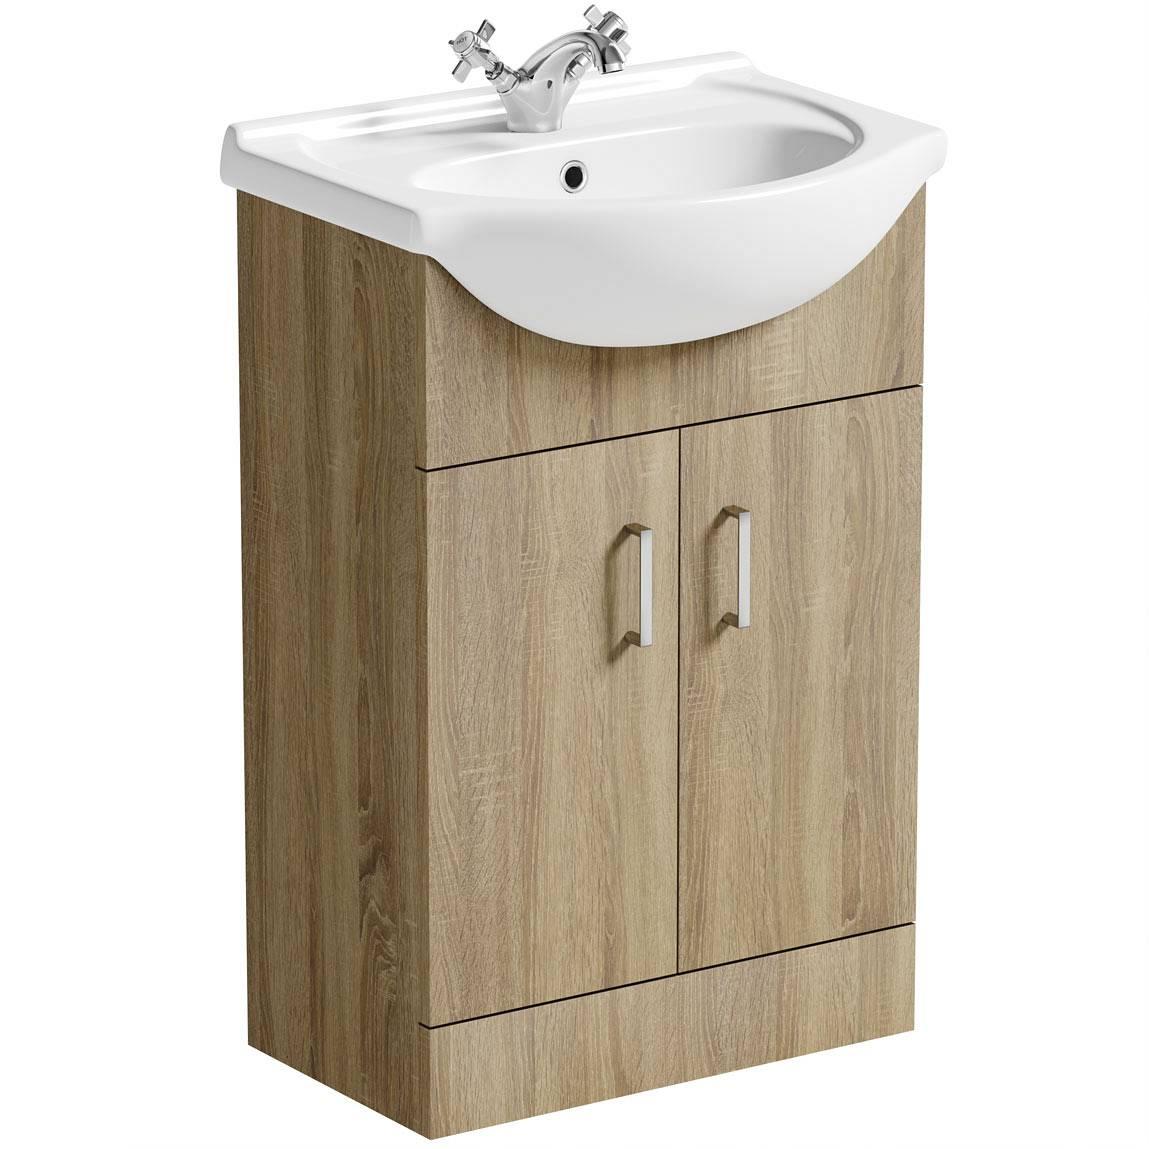 Image of Sienna Oak 55 Vanity Unit & Basin